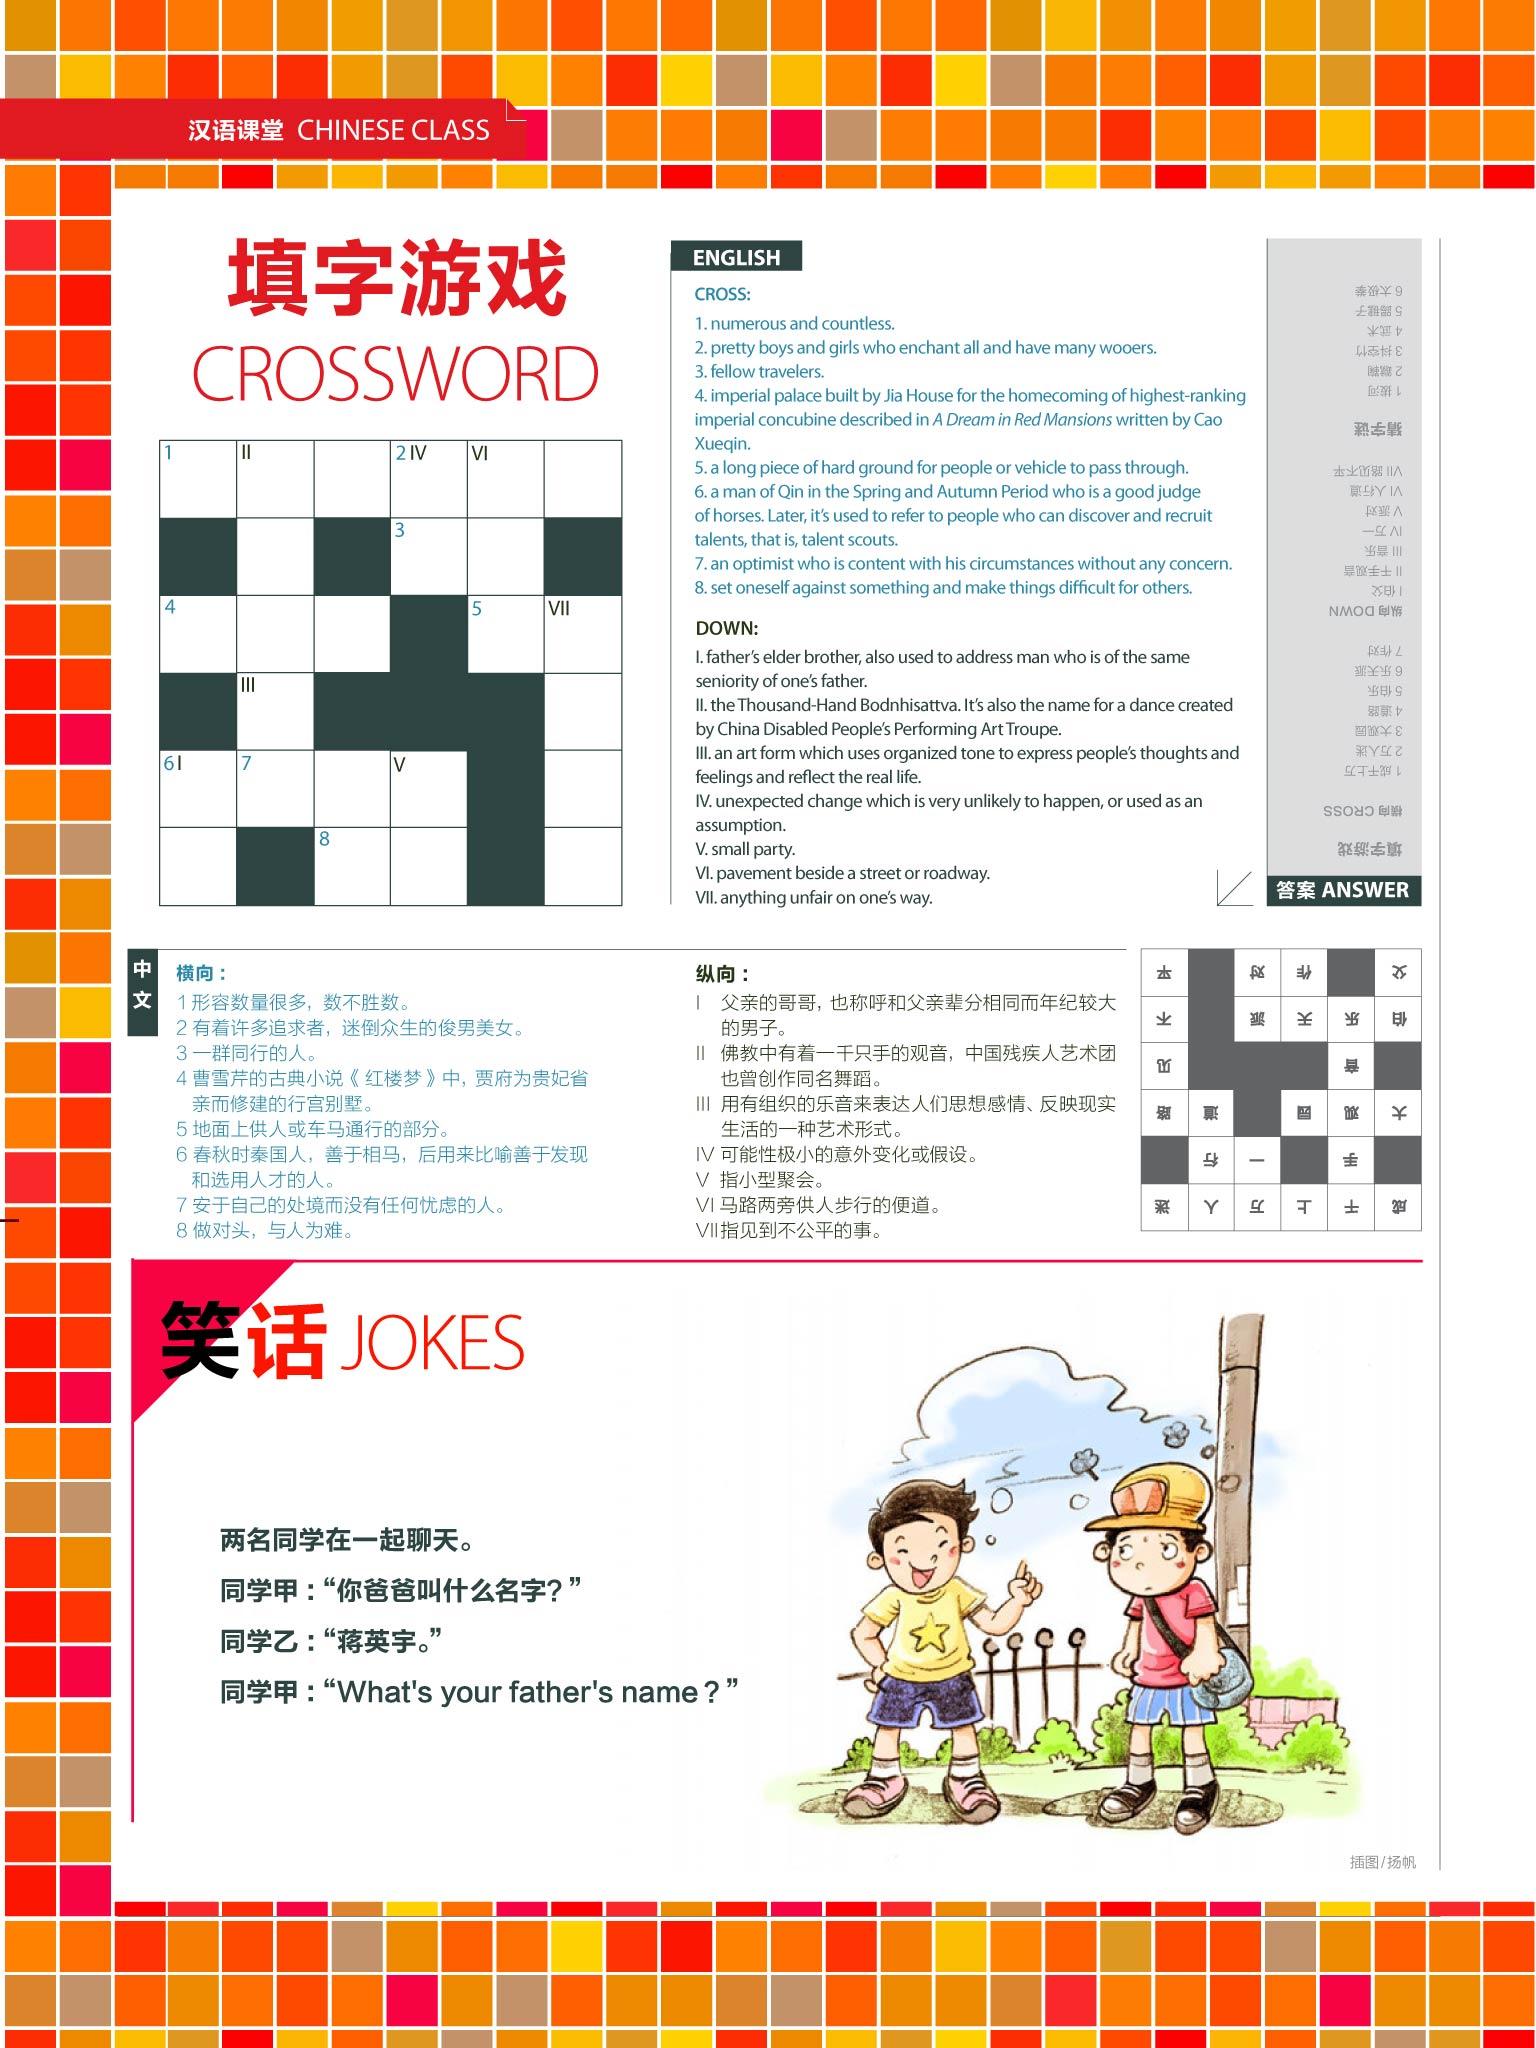 Chinese class 18